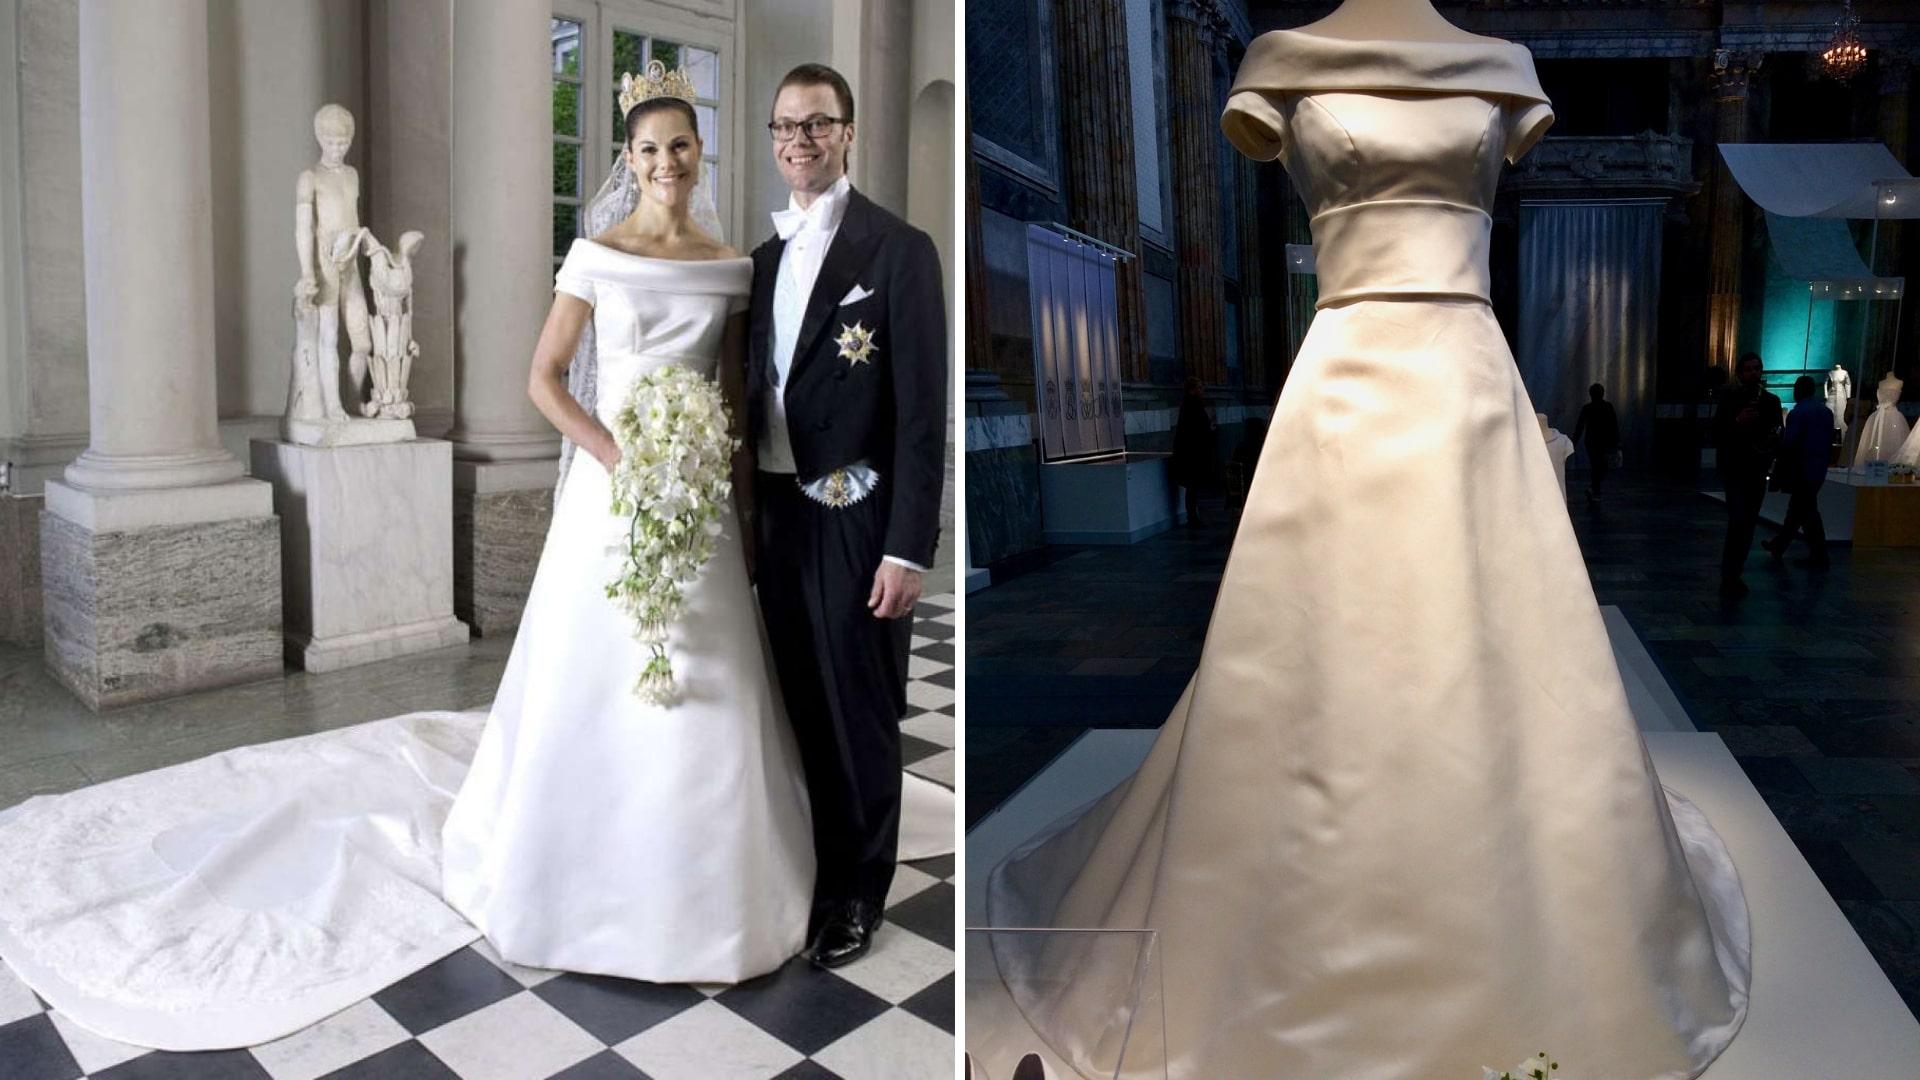 Crown Princess Victoria of Sweden in her Bridal Dress